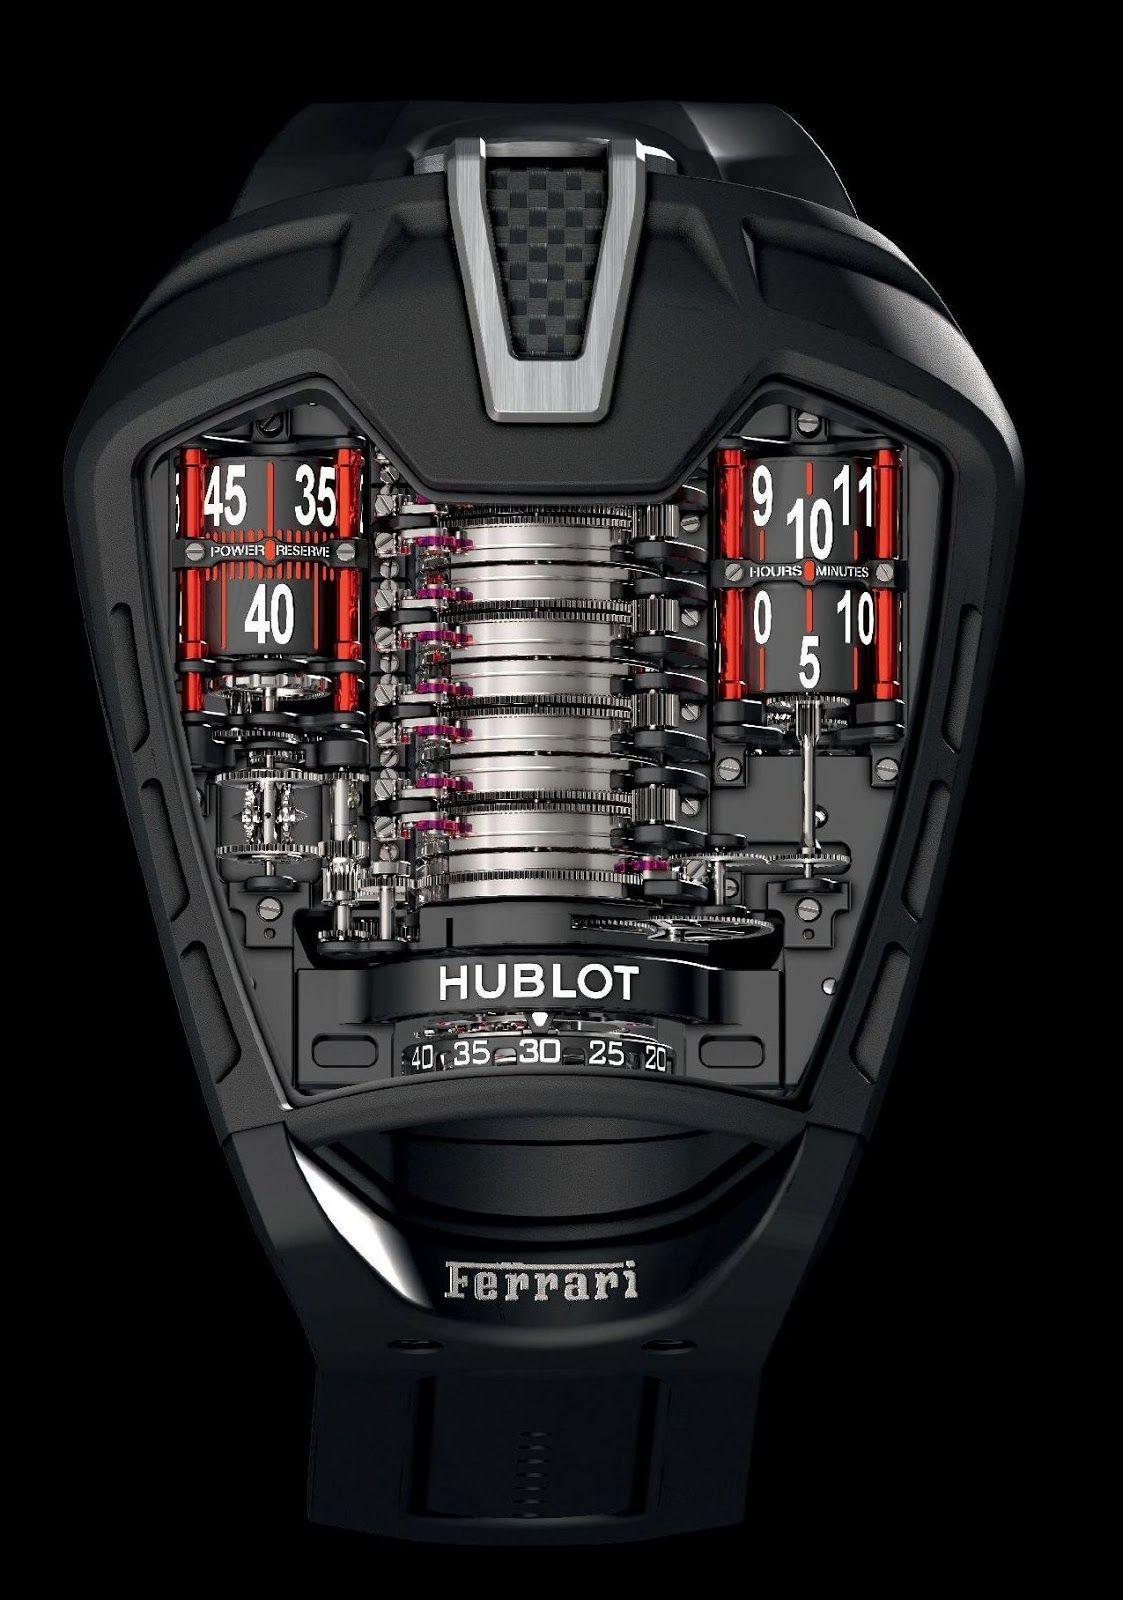 Hip Hop Instrumentals Kid Dyno Inc Lease Beats Buy Beats Futuristic Watches Ferrari Watch Hublot